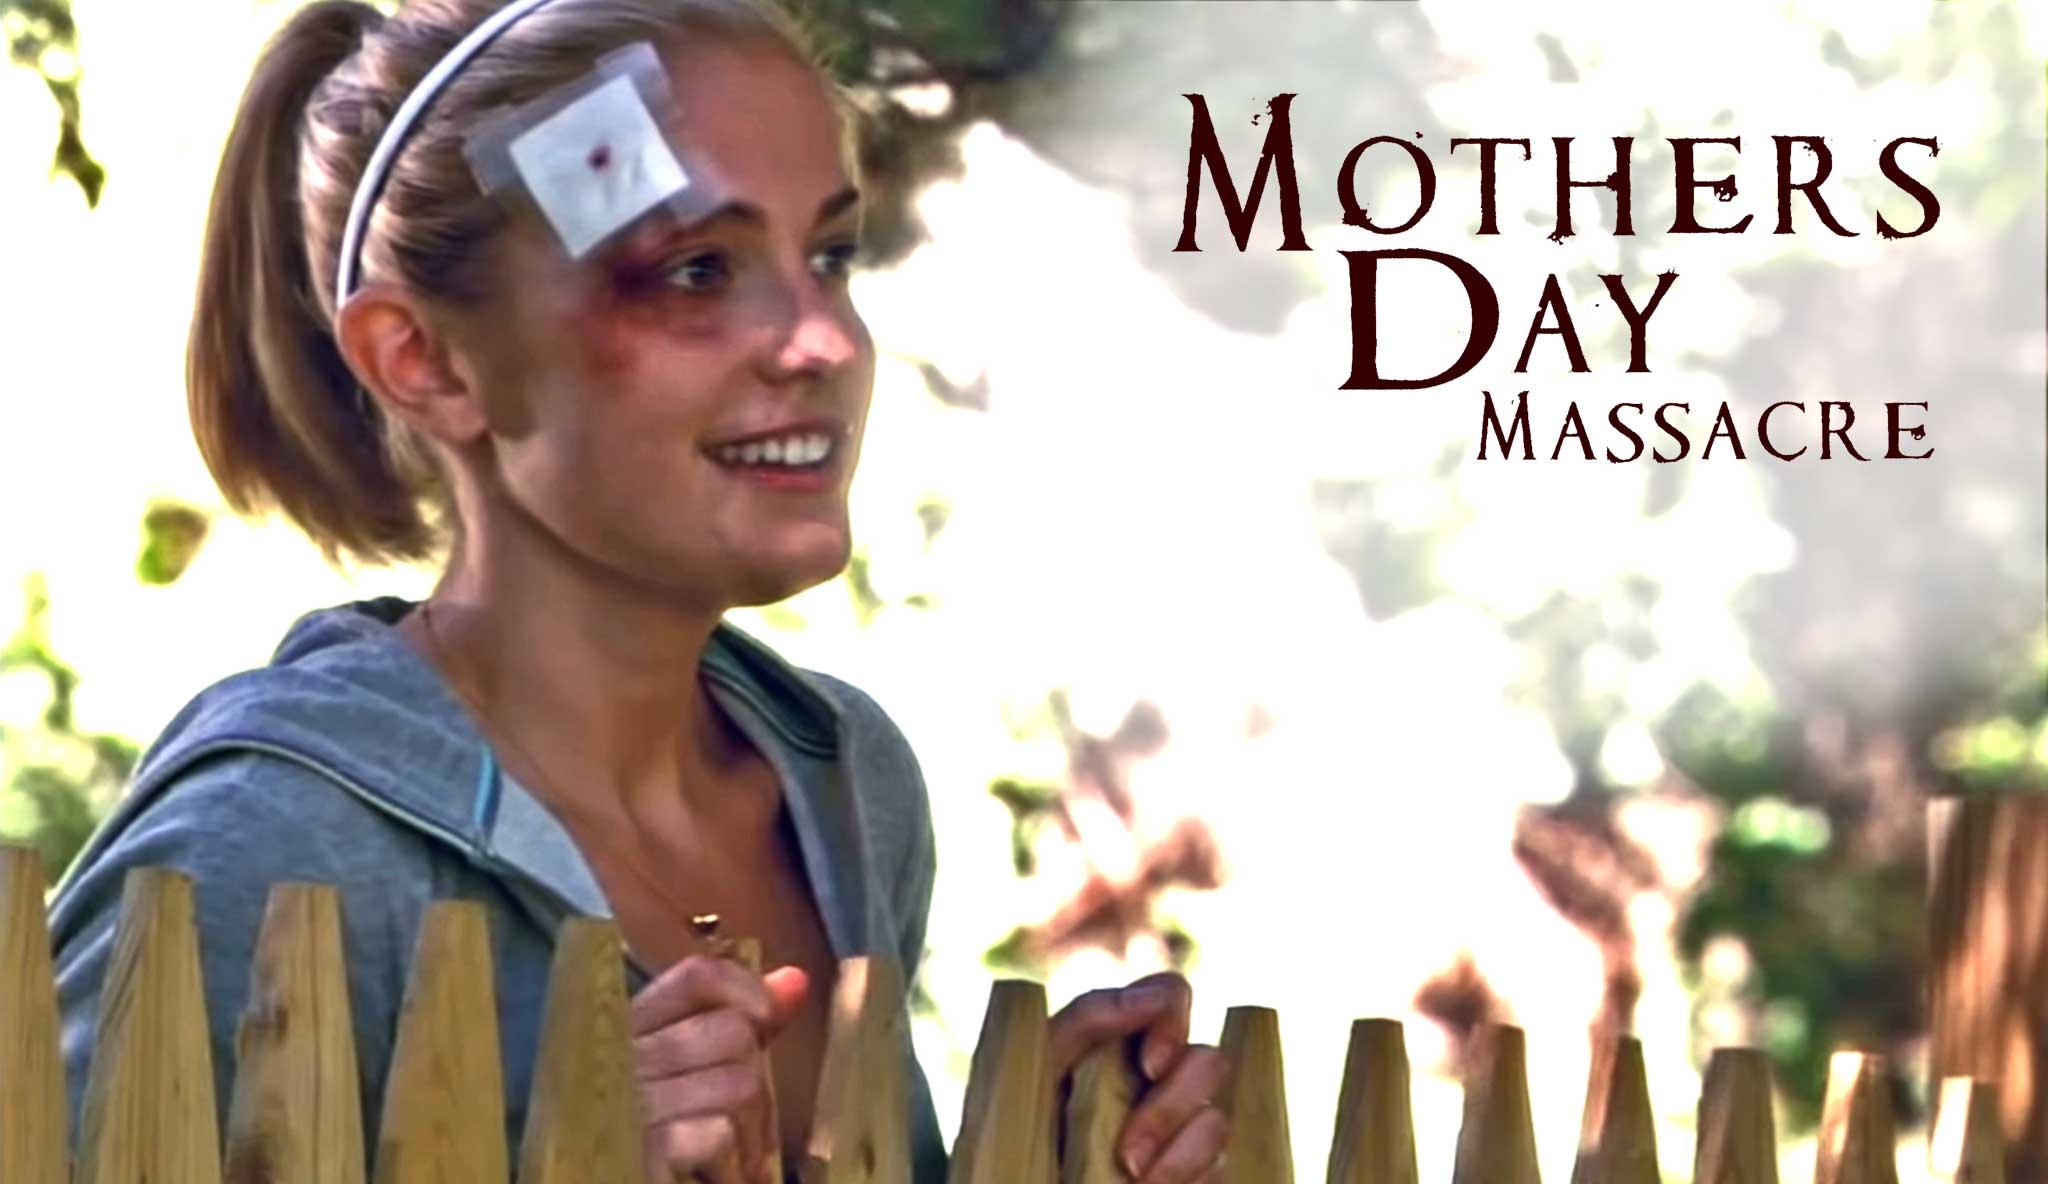 mothers-day-massacre\header.jpg